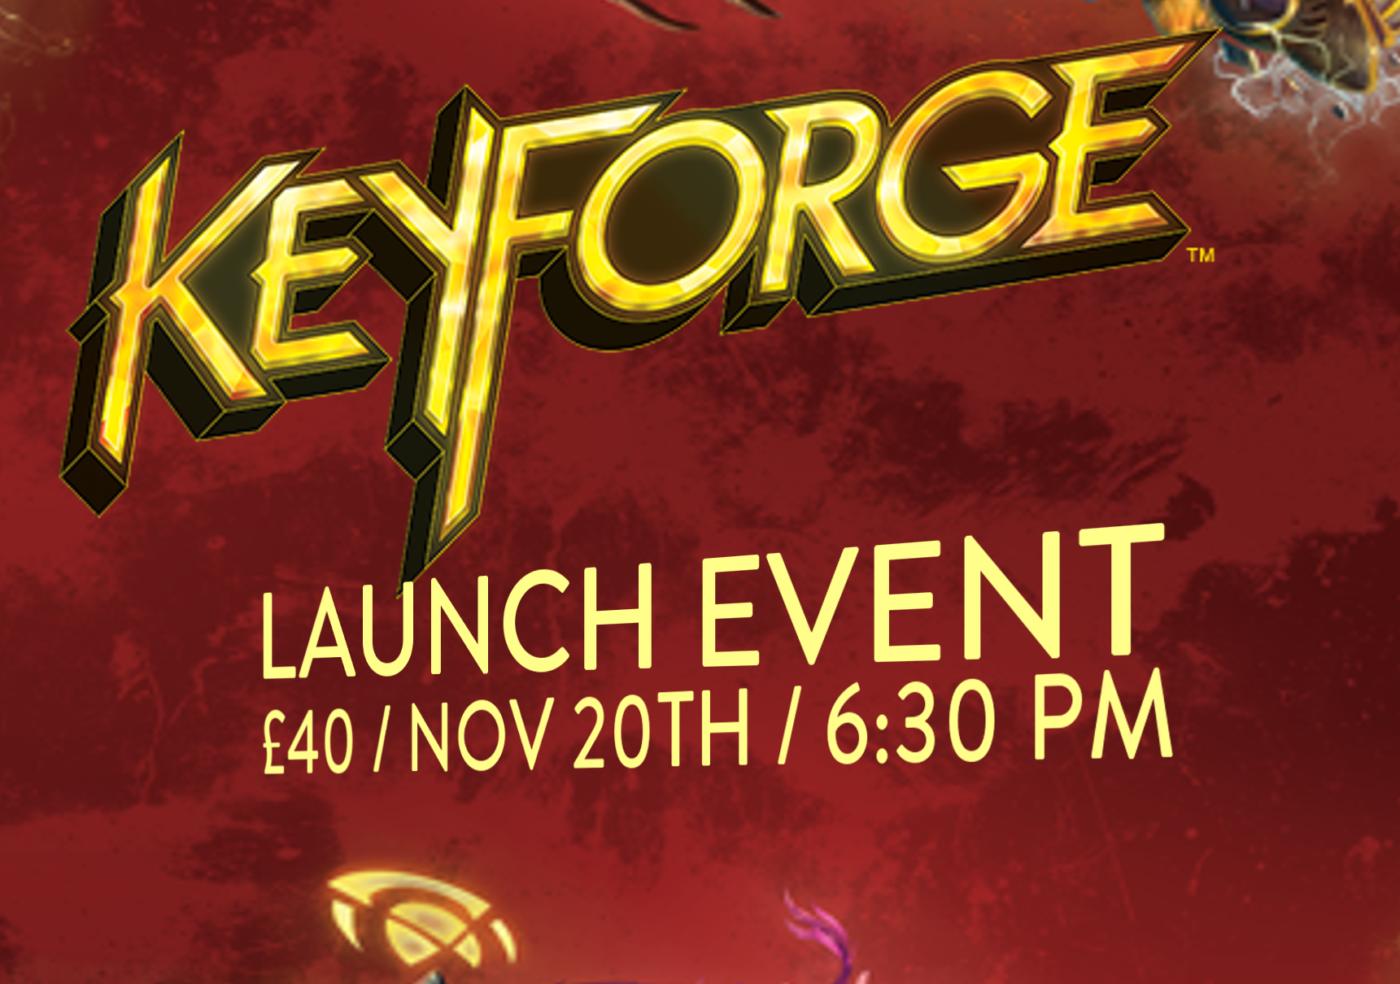 Keyforge Launch Event & Tournament!